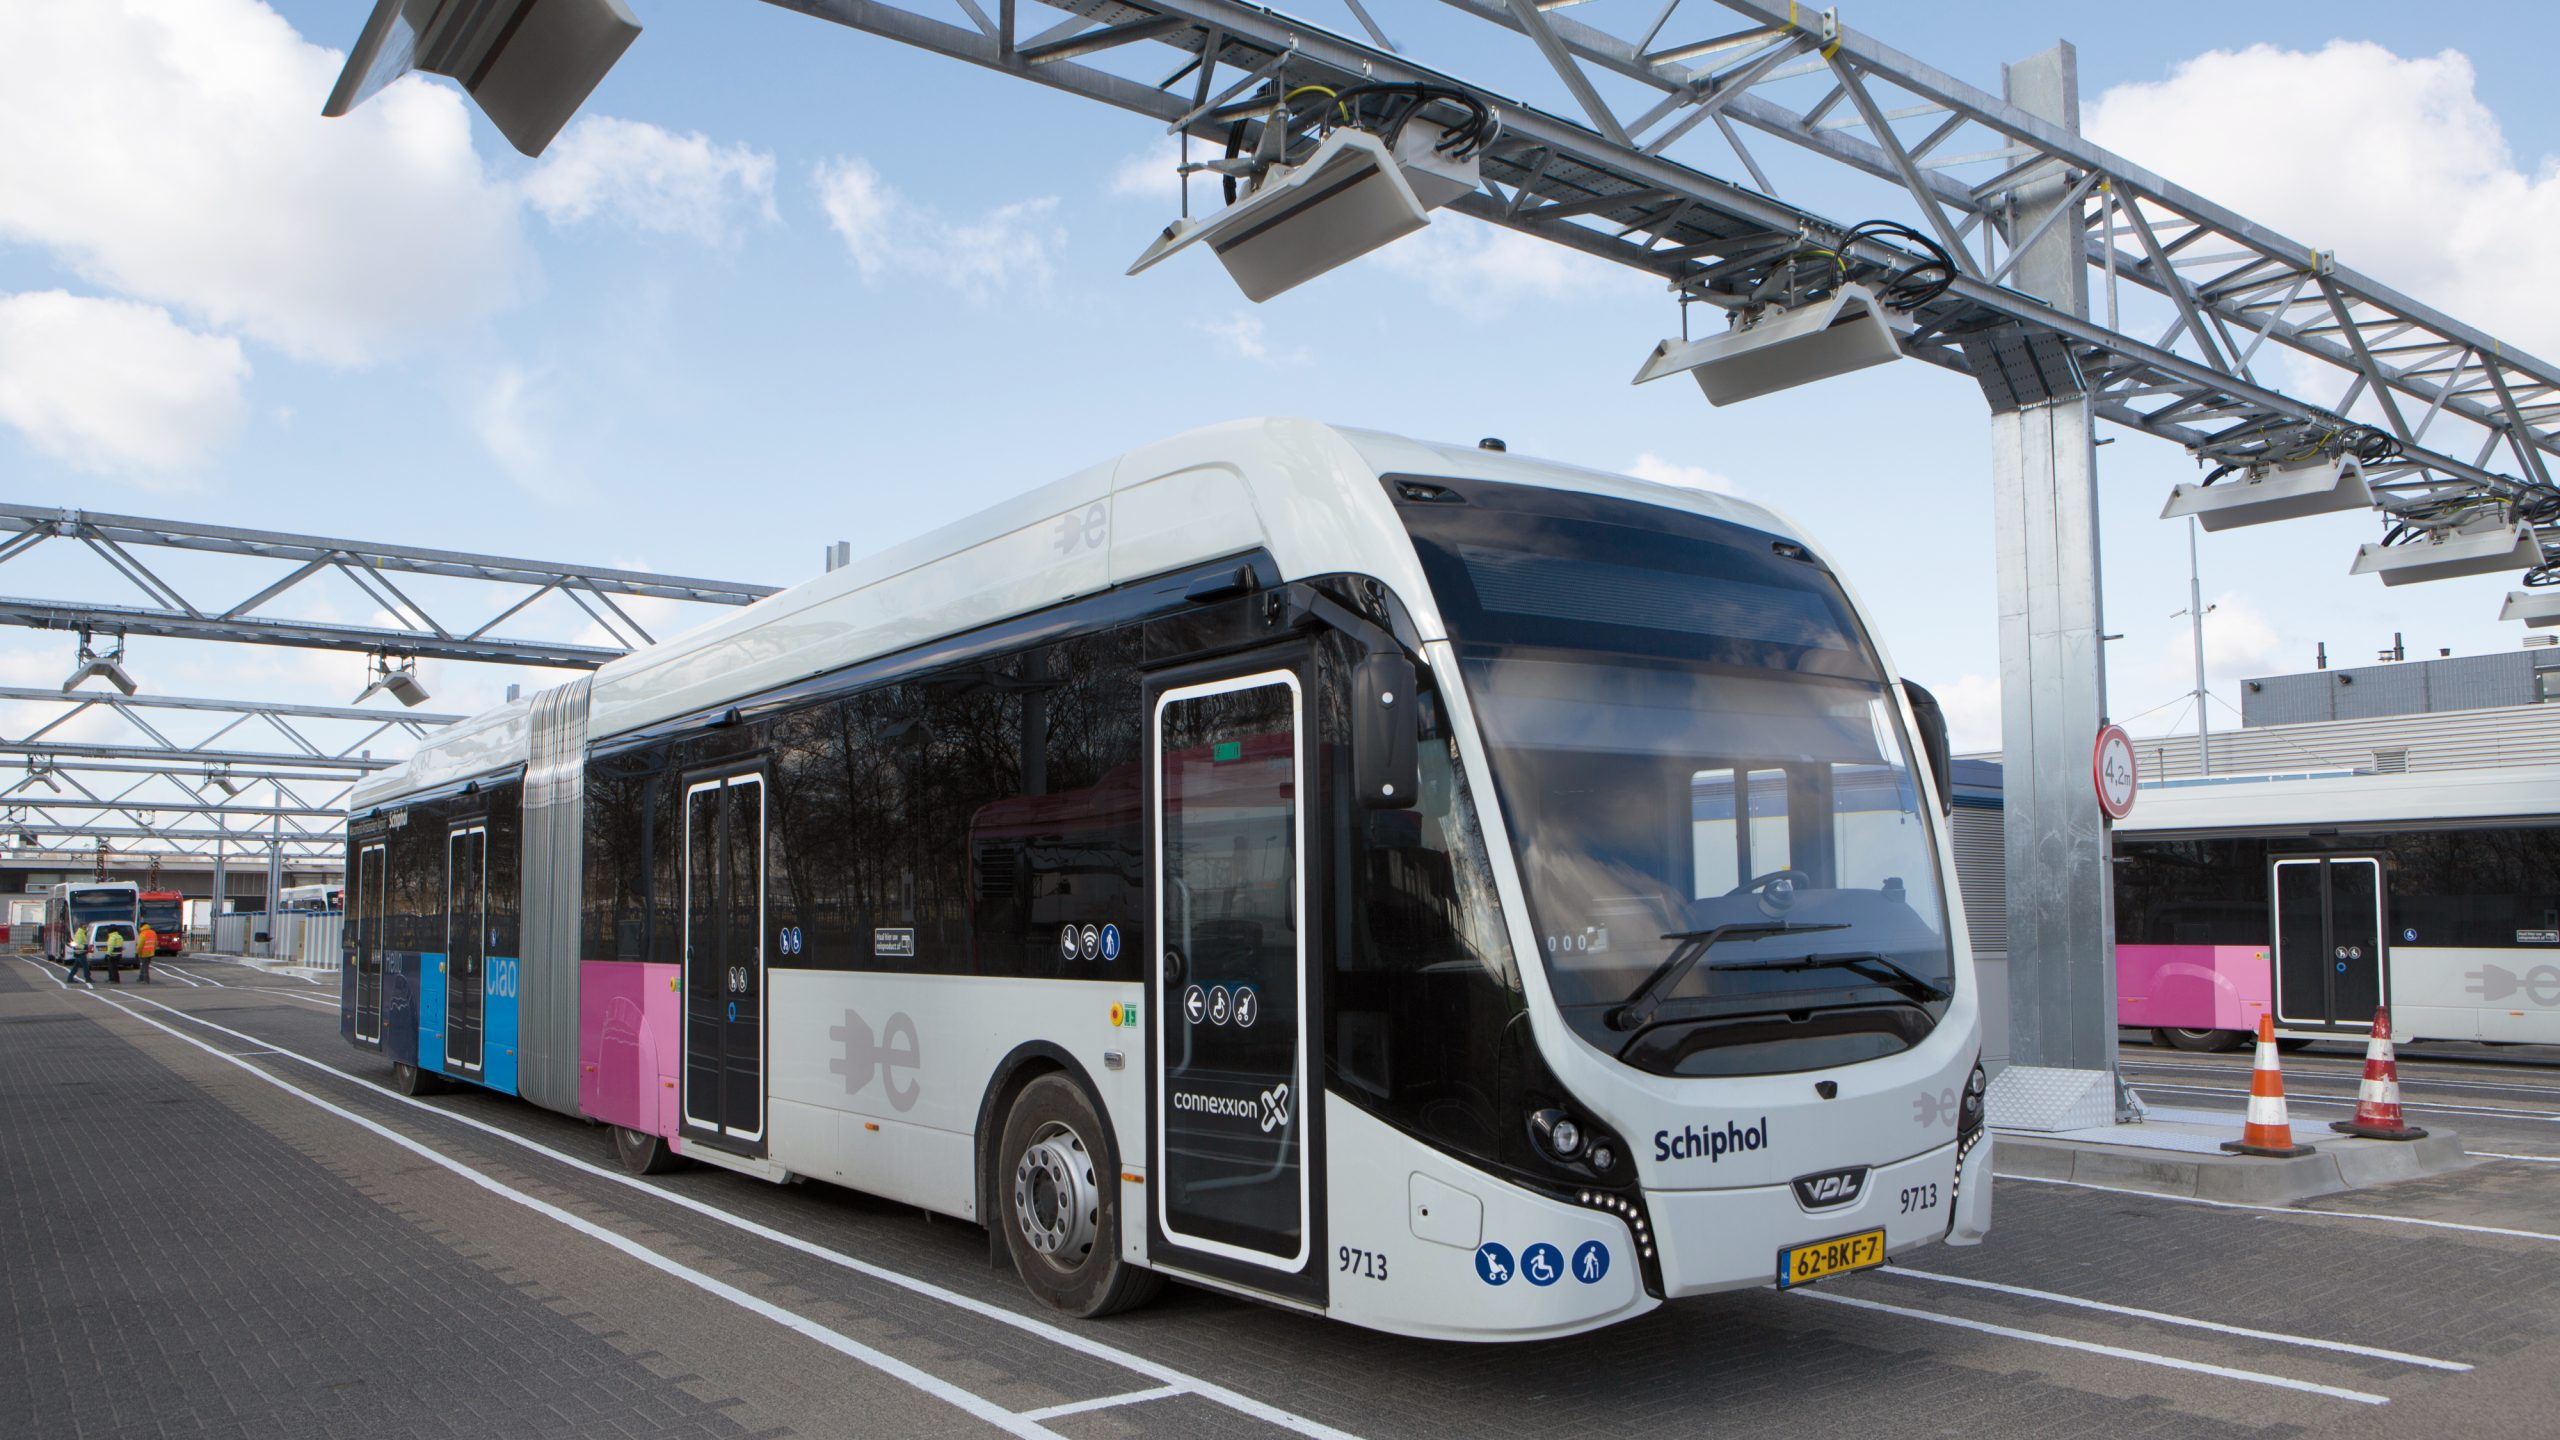 Carregamento rápido para ônibus elétricos